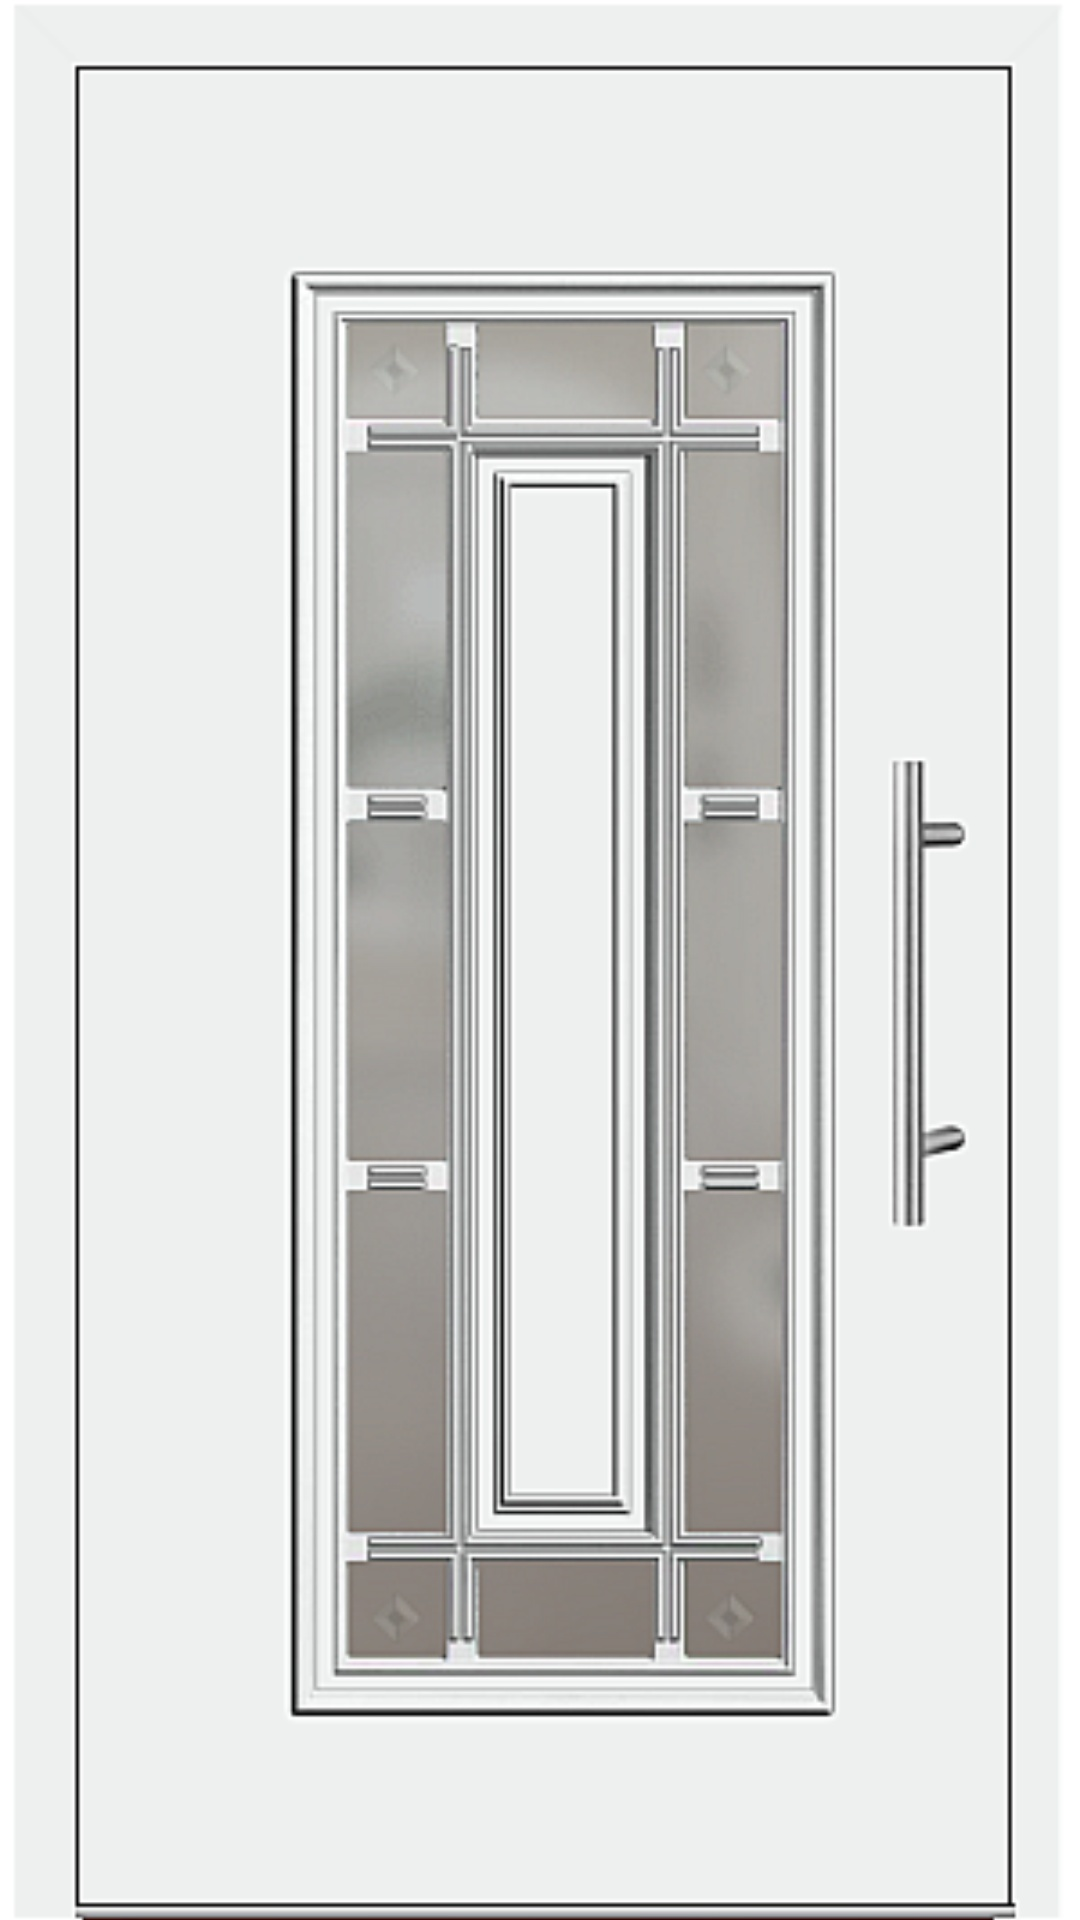 Aluminium Haustür Modell 4150-11 weiß